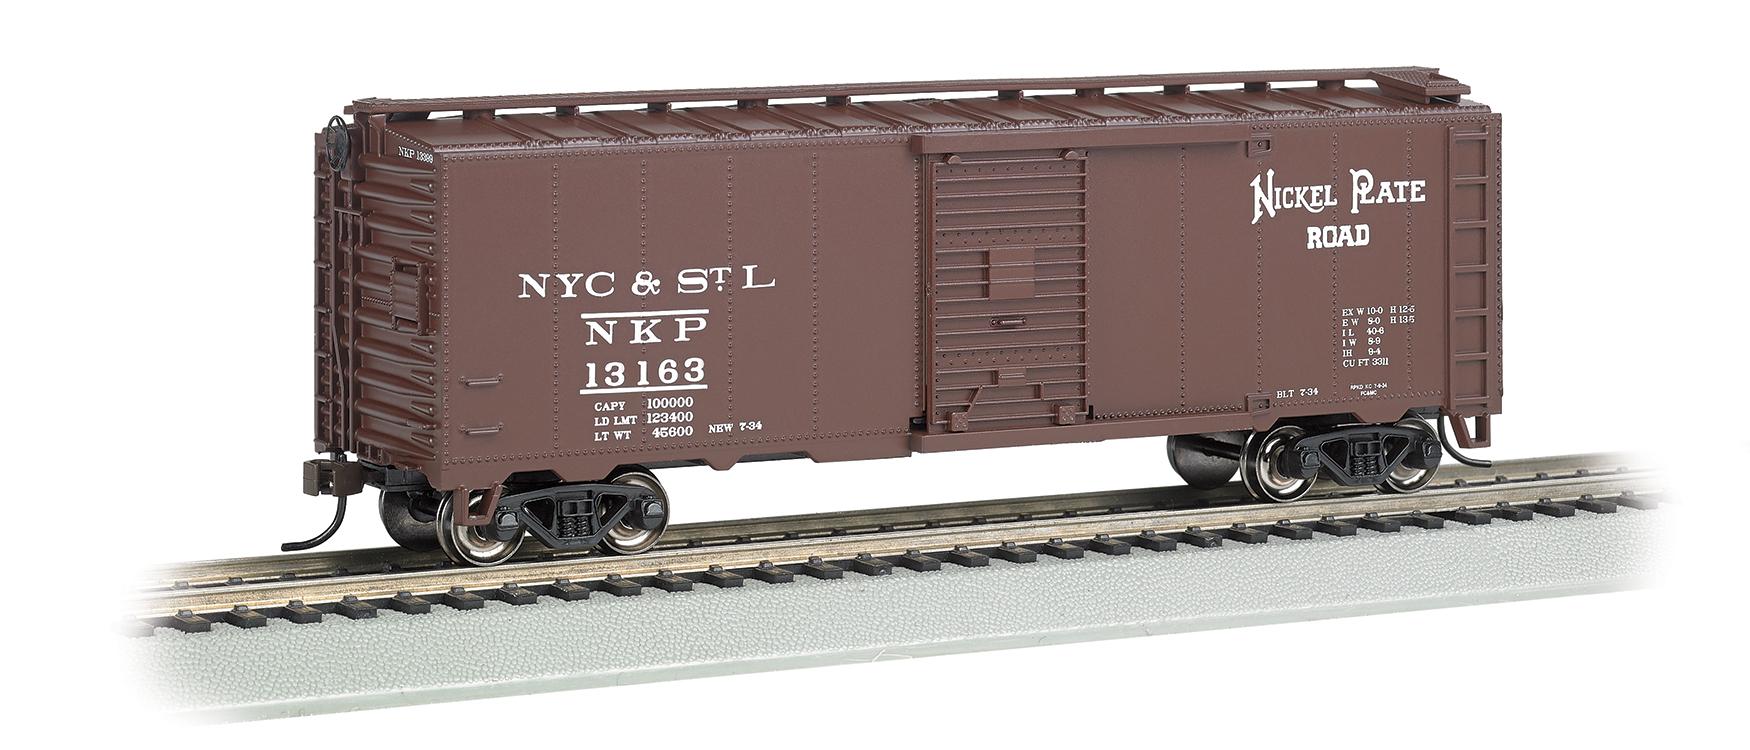 Details about  /HO Scale Bowser 42728 Nickel Plate Road NKP 1640240/' Single-Door Steel Boxcar